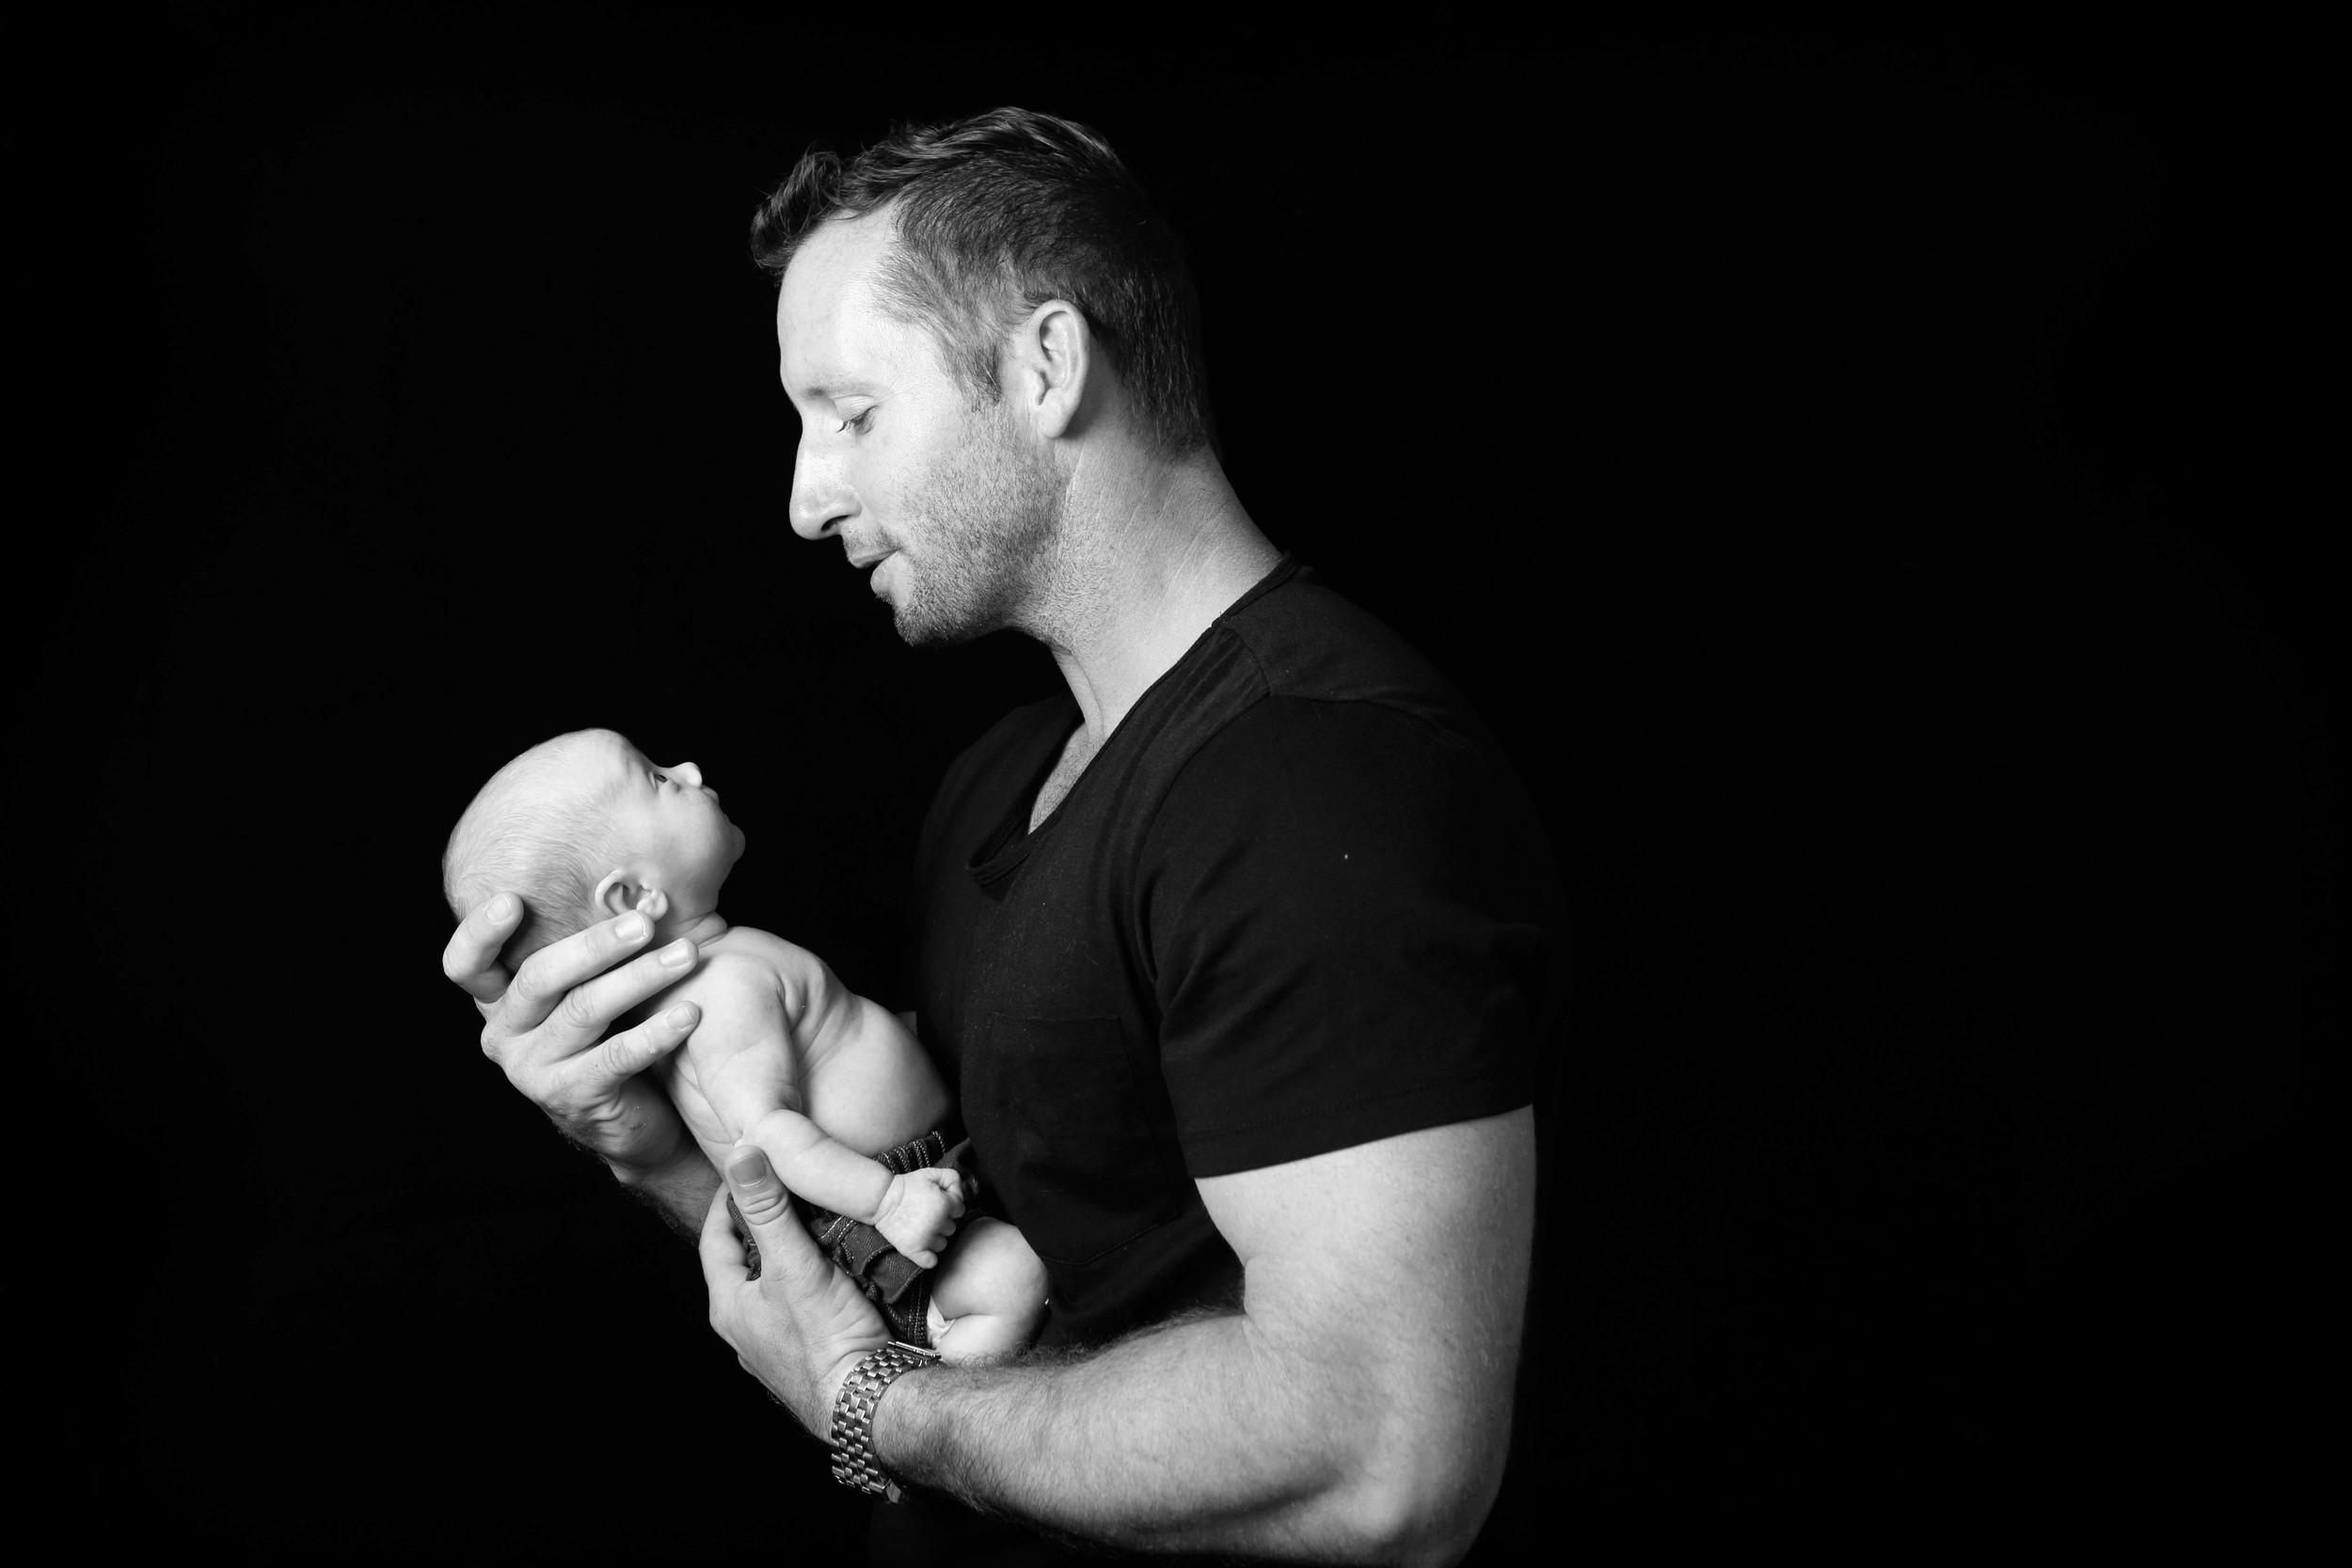 dad with newborn baby